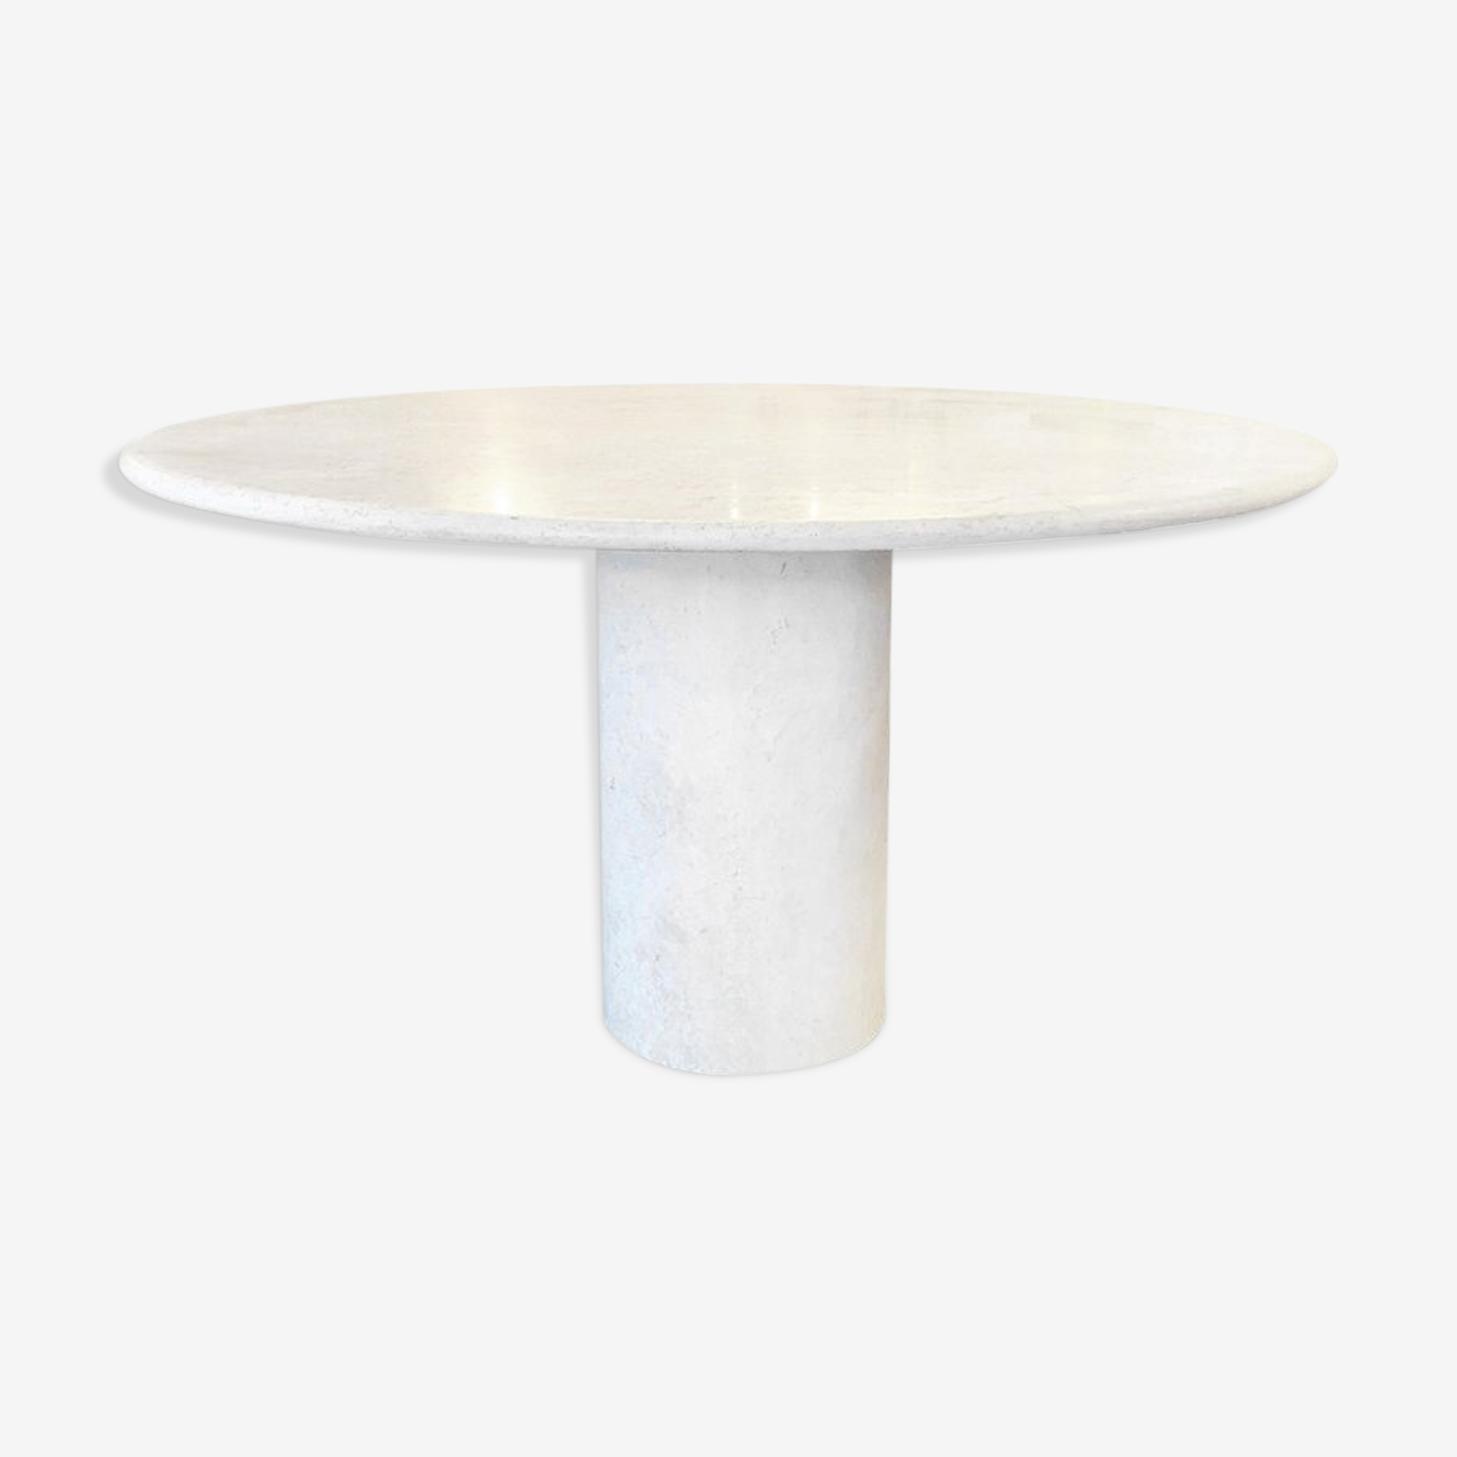 Dining pedestal table in travertine, circa 1970